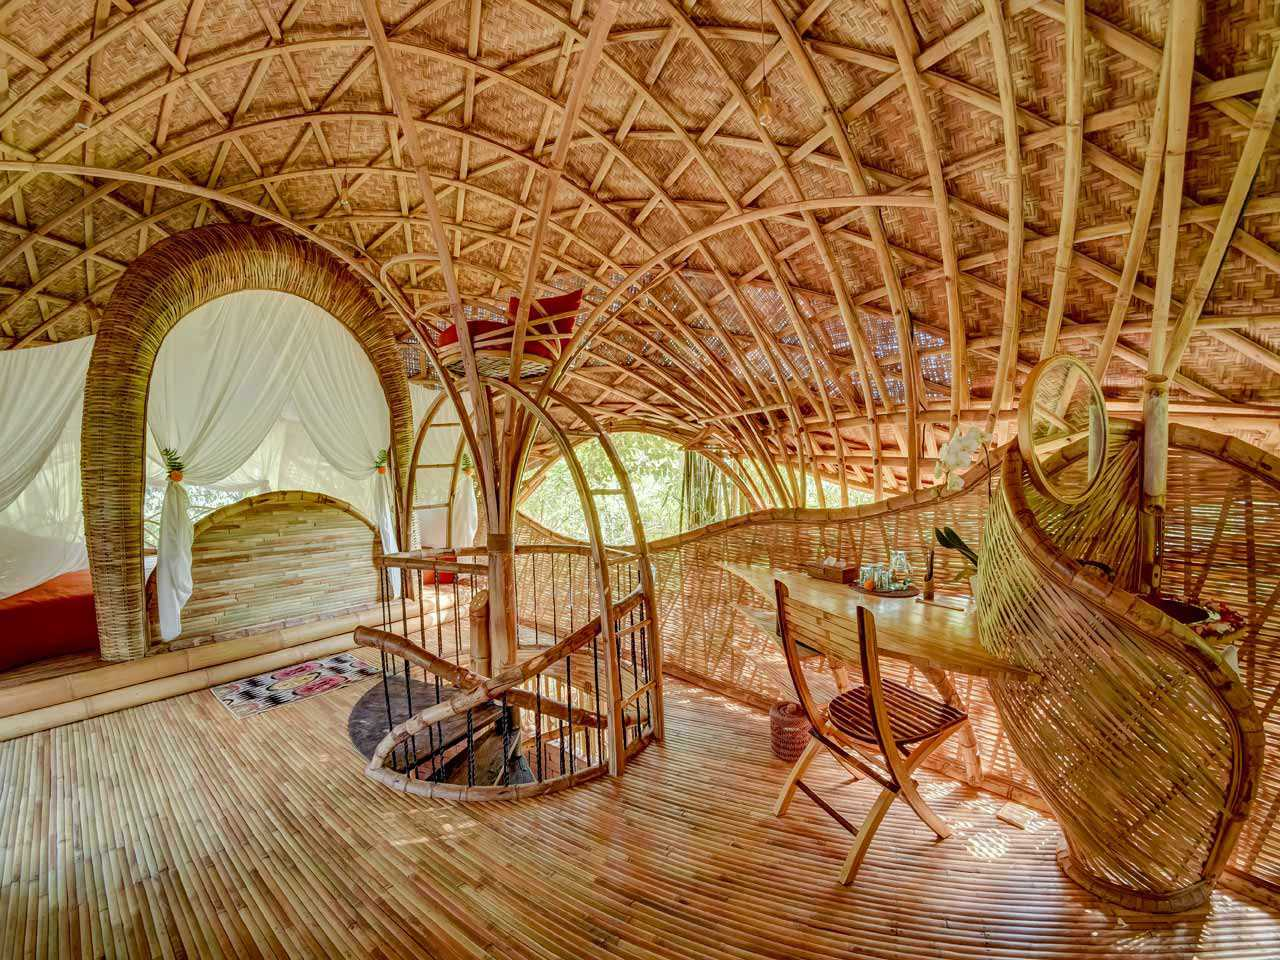 Agung Budi Raharsa | Architecture & Engineering Riverbend Bamboo House - Bali Bali, Indonesia Bali, Indonesia Agung-Budi-Raharsa-Riverbend-House-Bali  88722